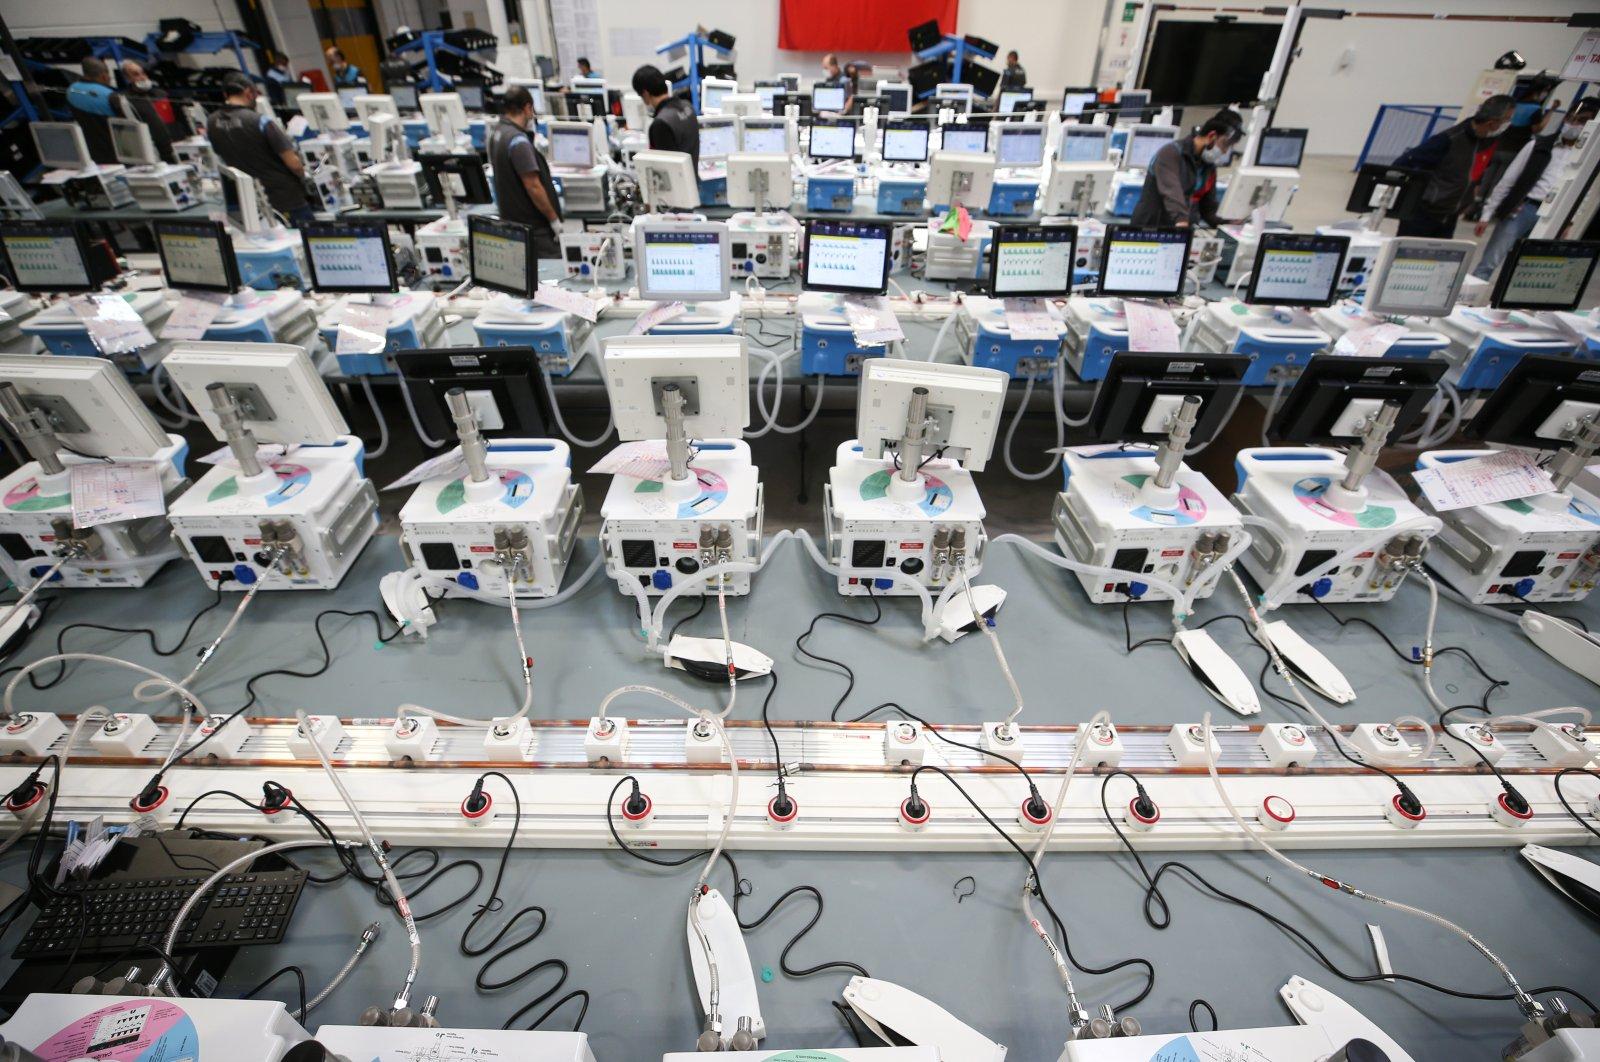 Turkish ventilators are seen in production at an Arçelik factory in Çerkezköy district, Tekirdağ province, Turkey, April 12, 2020. (AA Photo)